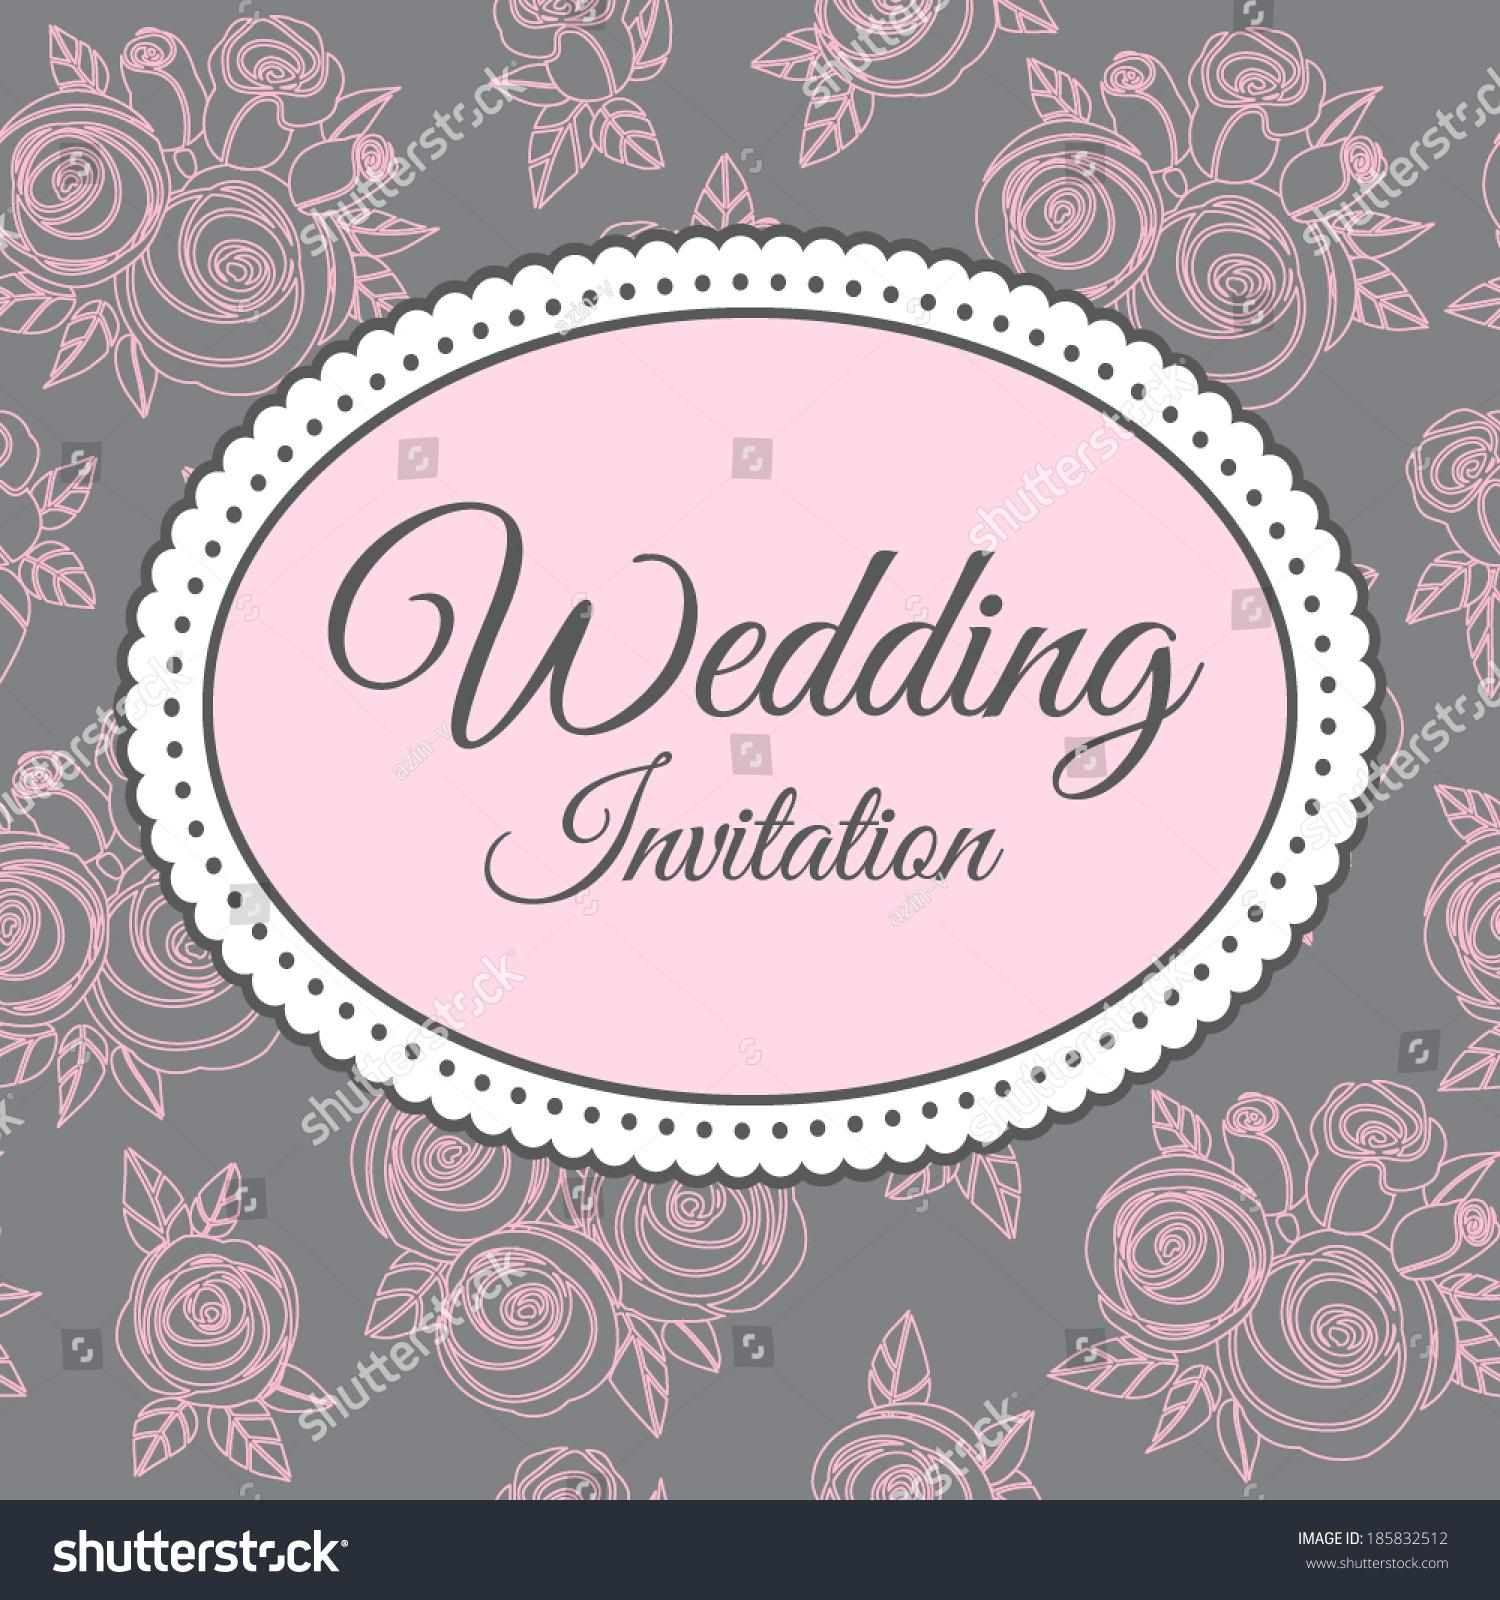 Wedding Invitation Vector as luxury invitations ideas